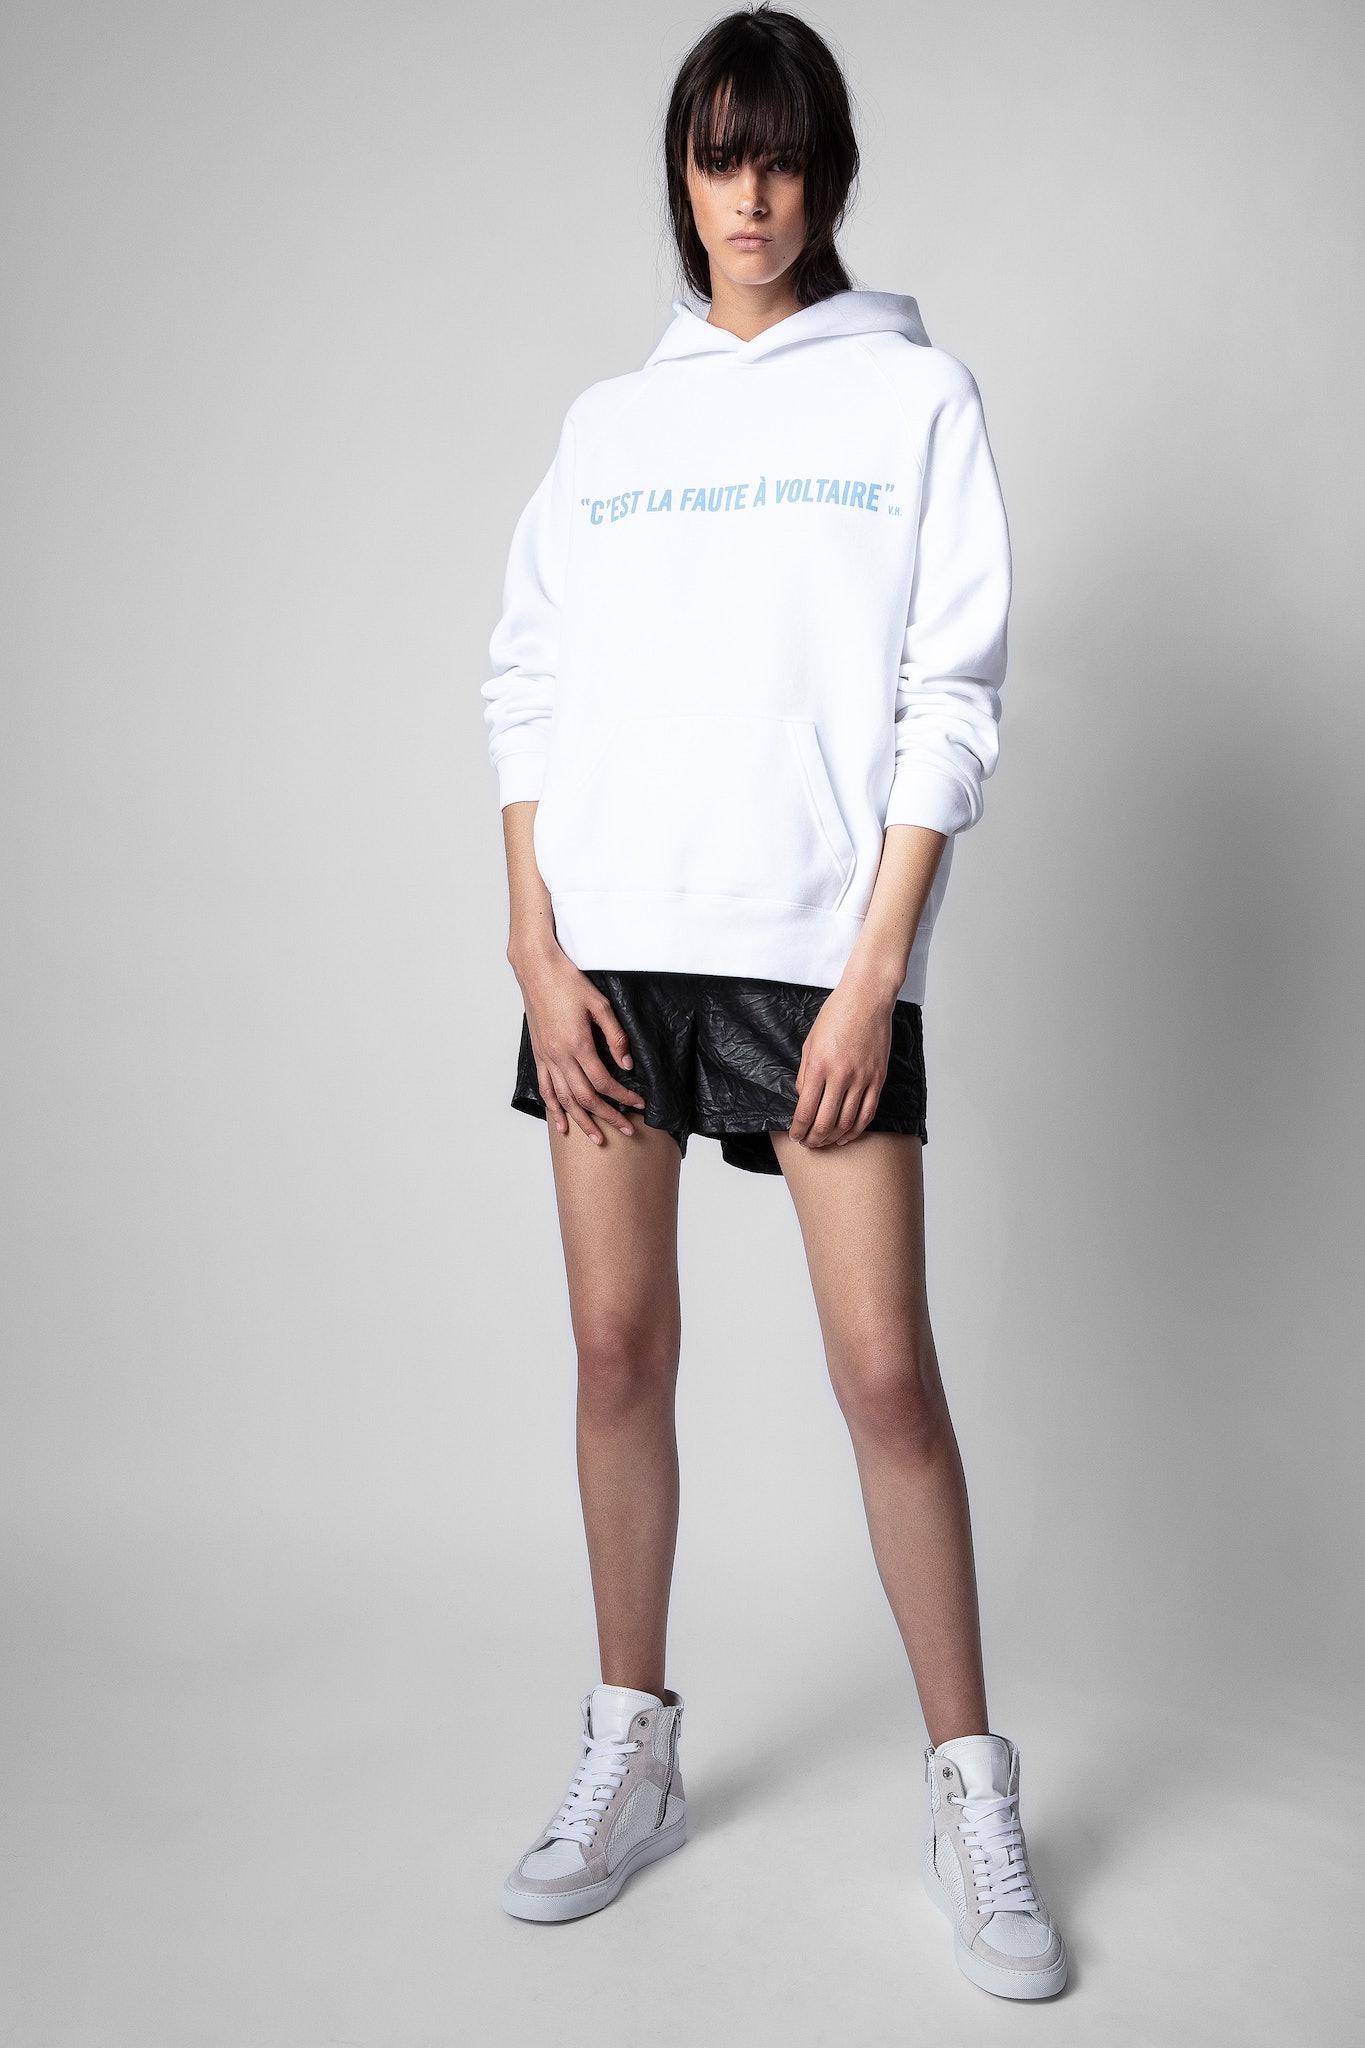 Georgy Photoprint Voltaire Sweatshirt